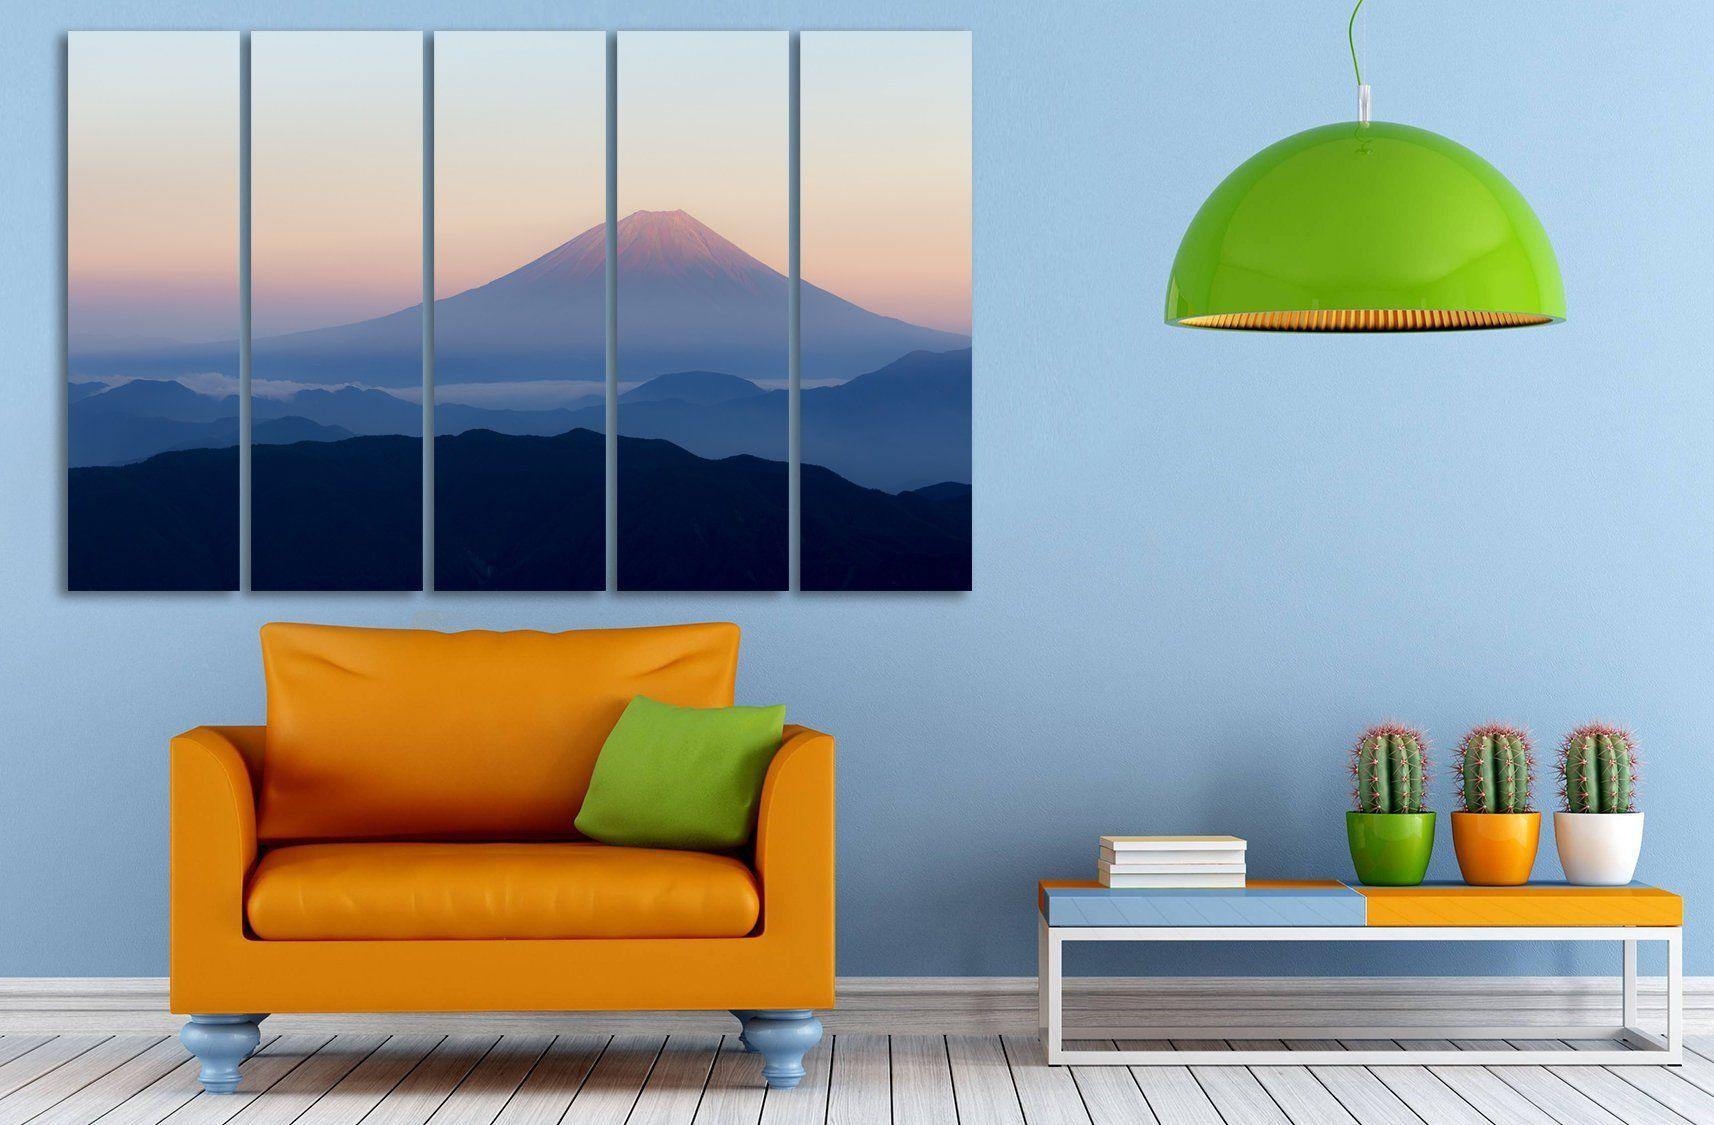 Smoky Mount Fuji Japanese Wall Art Nature Extra Large Split Canvas Extralargewalldecor Extralargeprint Hom Japanese Wall Art Japanese Wall Nature Wall Decor